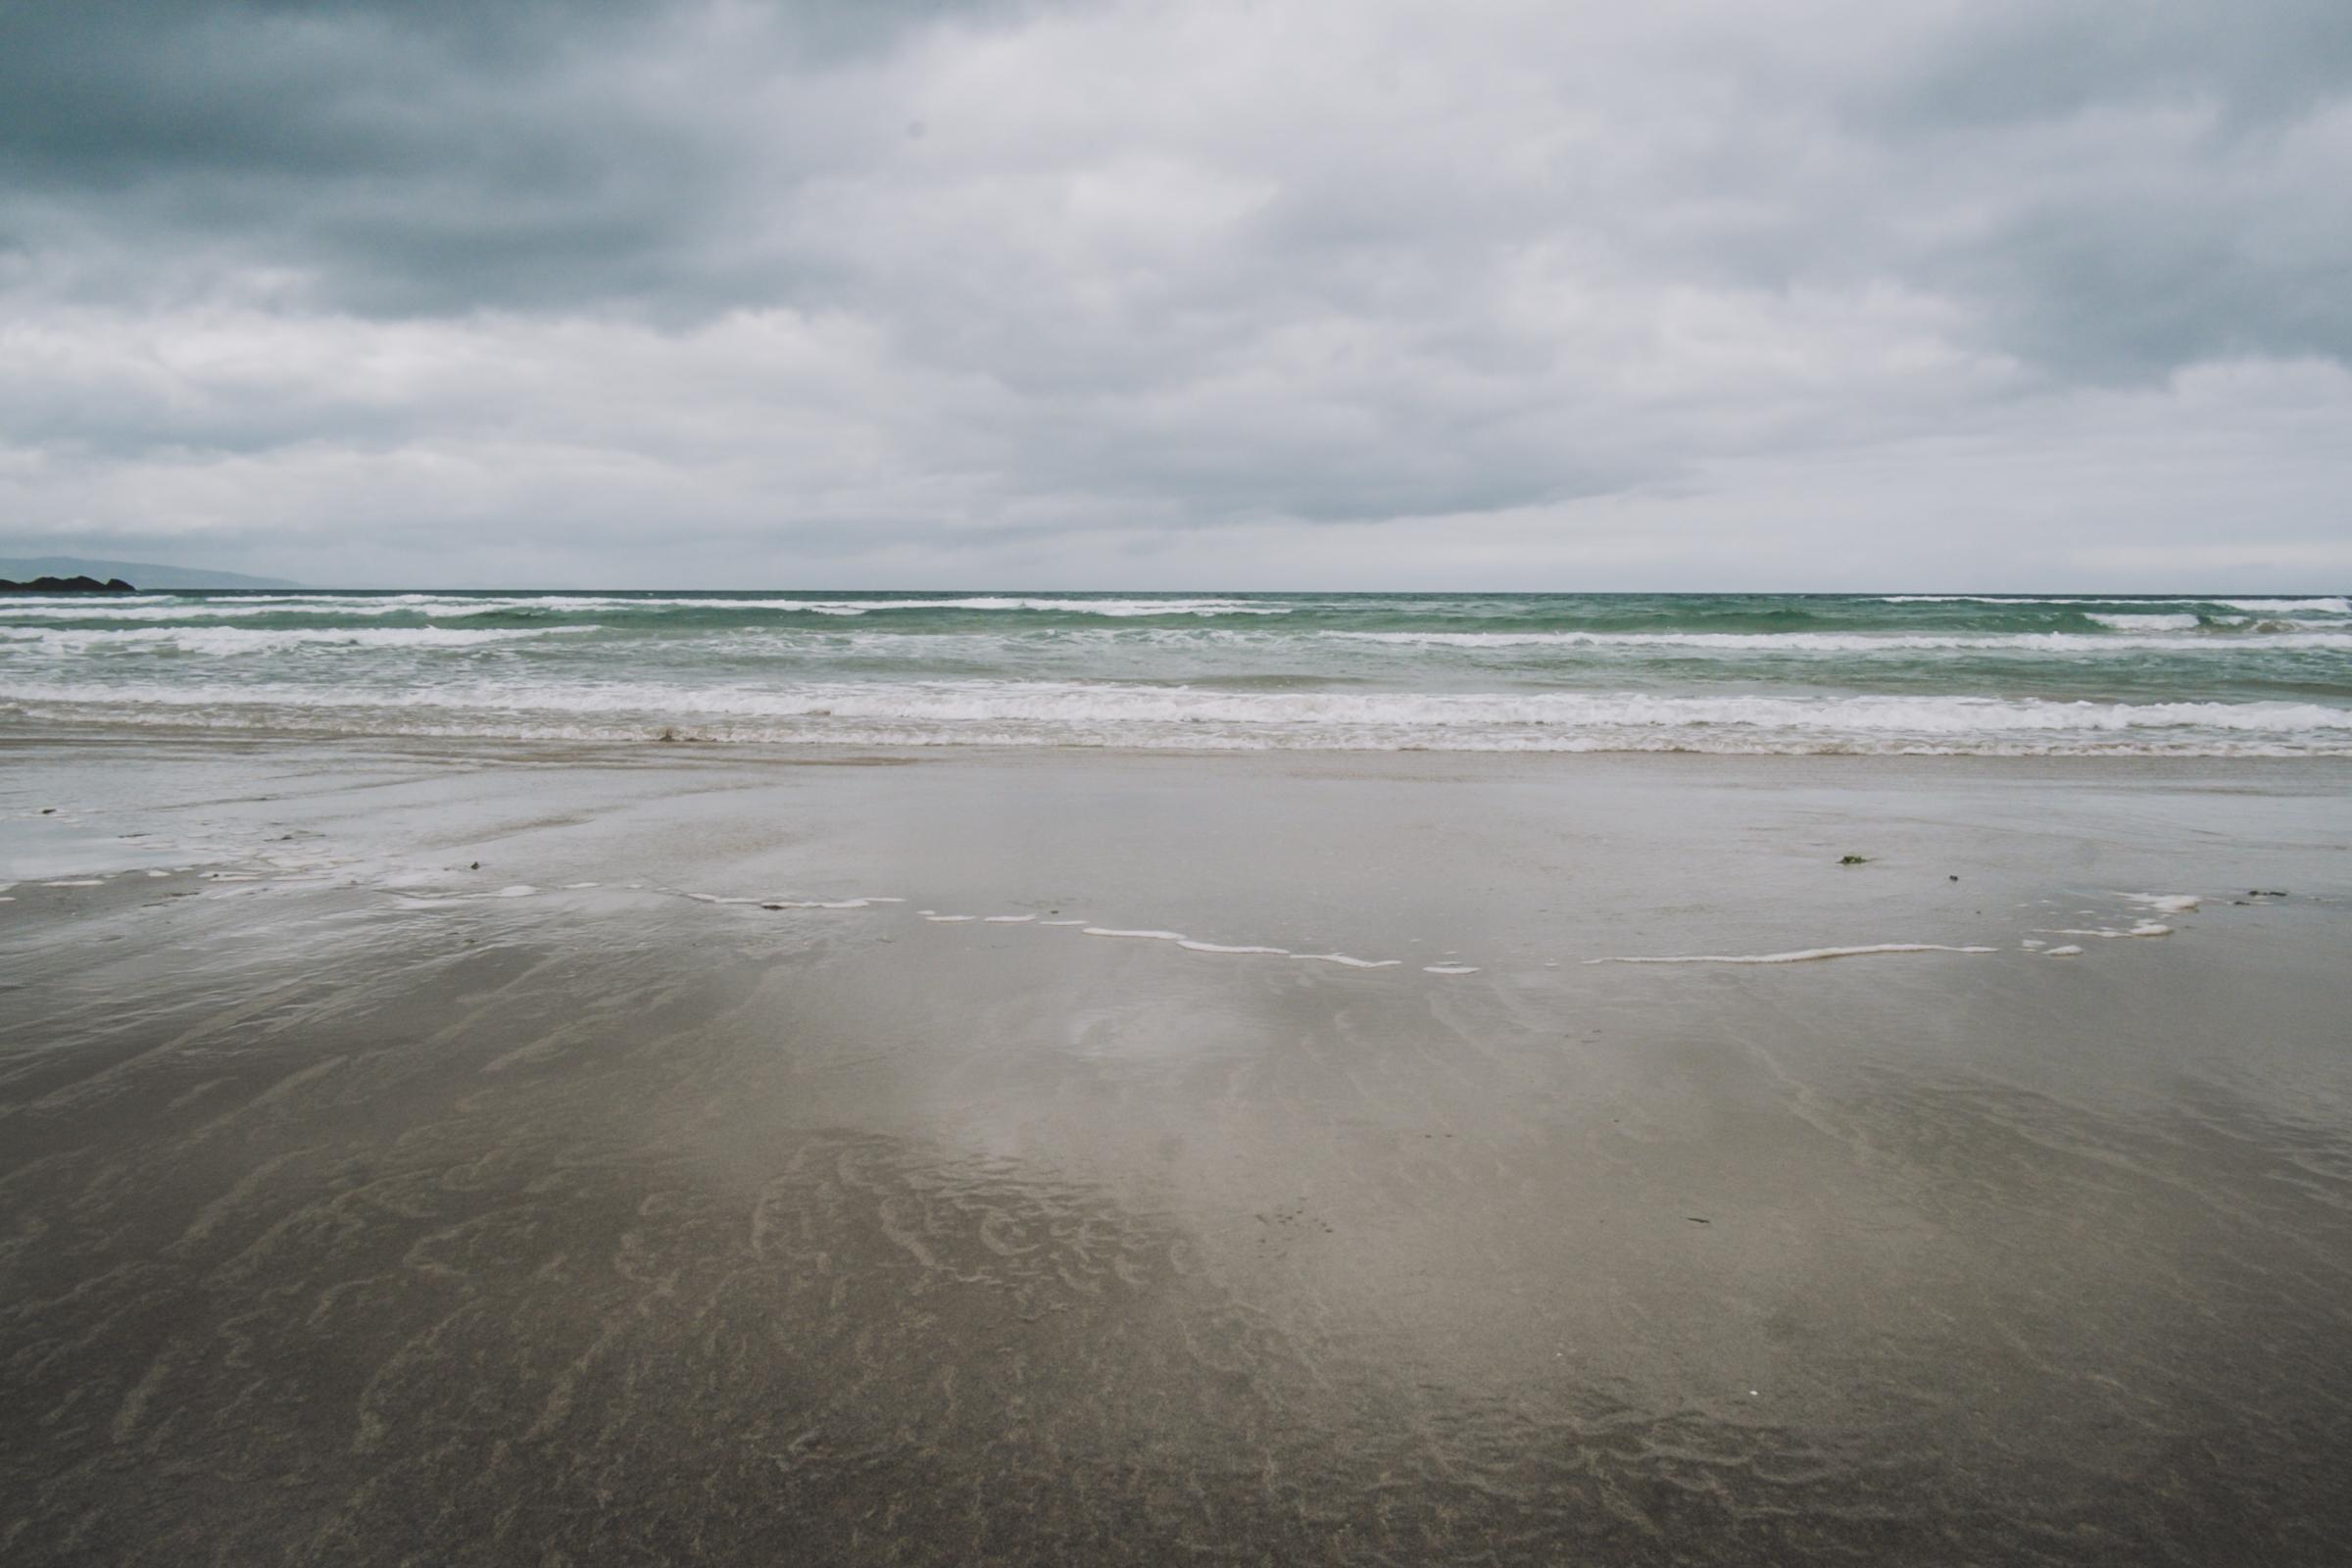 20150617-078-Ireland_Travel_Editorial.jpg